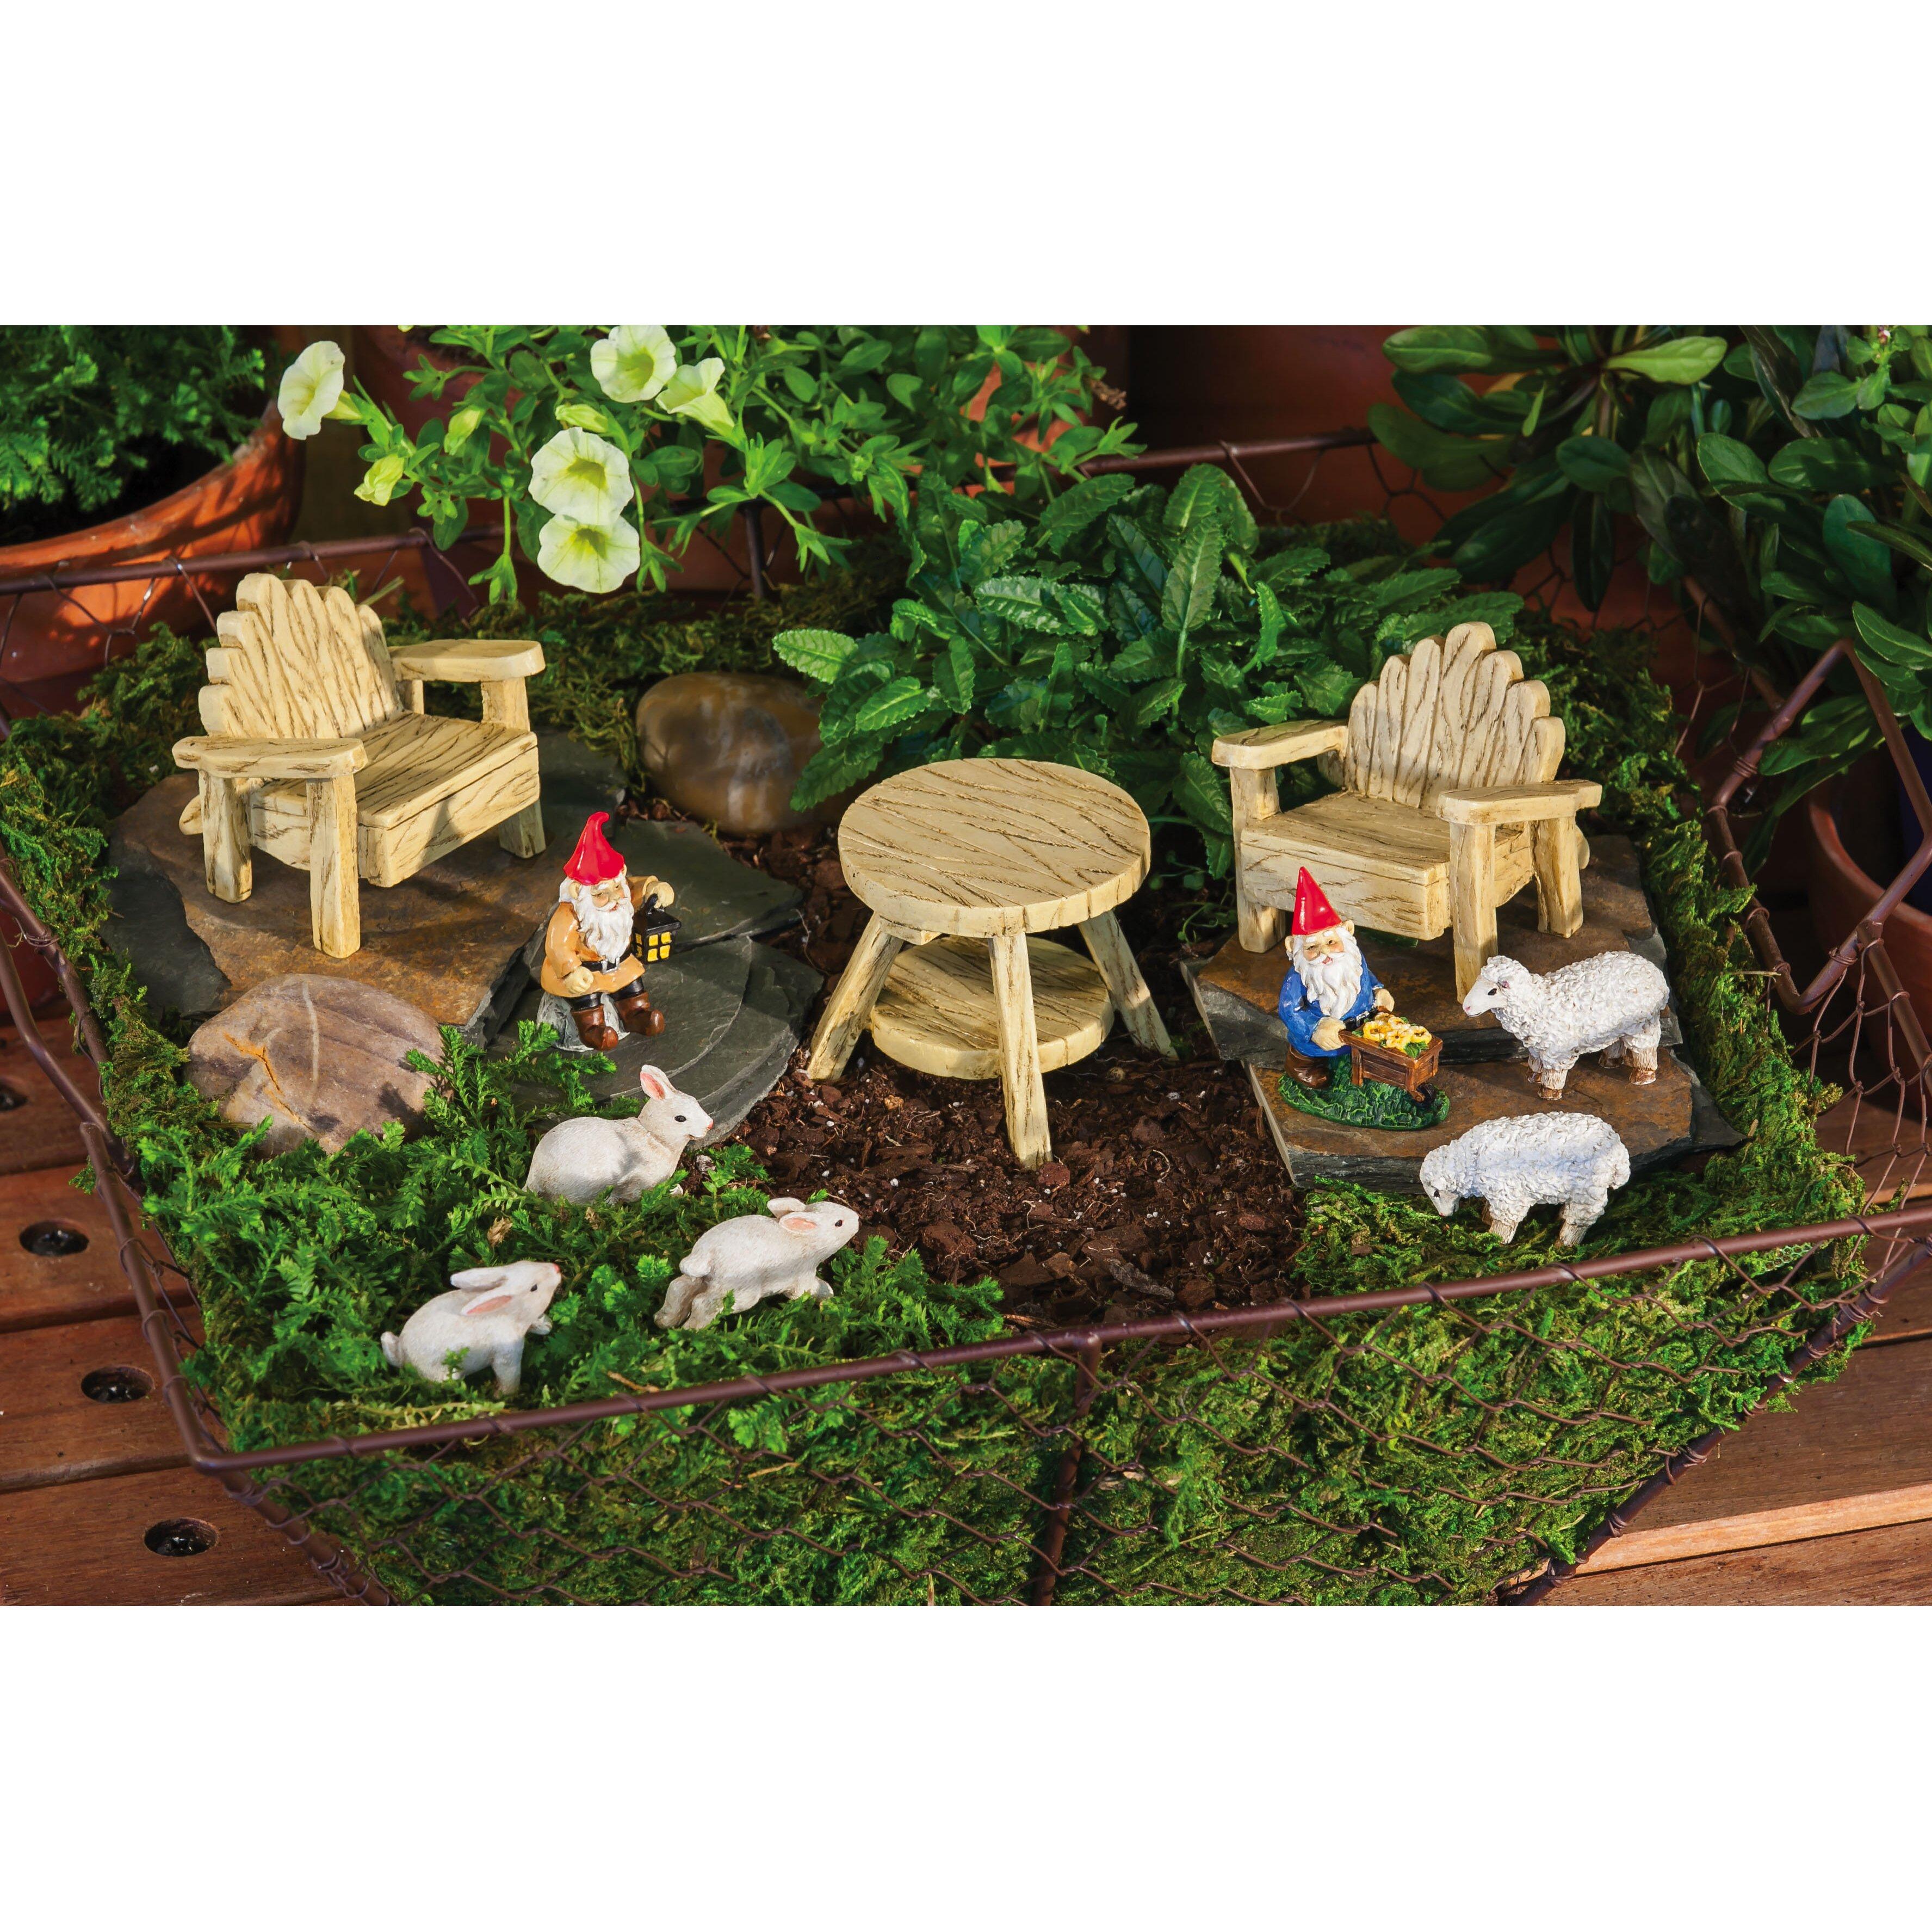 New Creative Rustic Garden Furniture Set Statue & Reviews